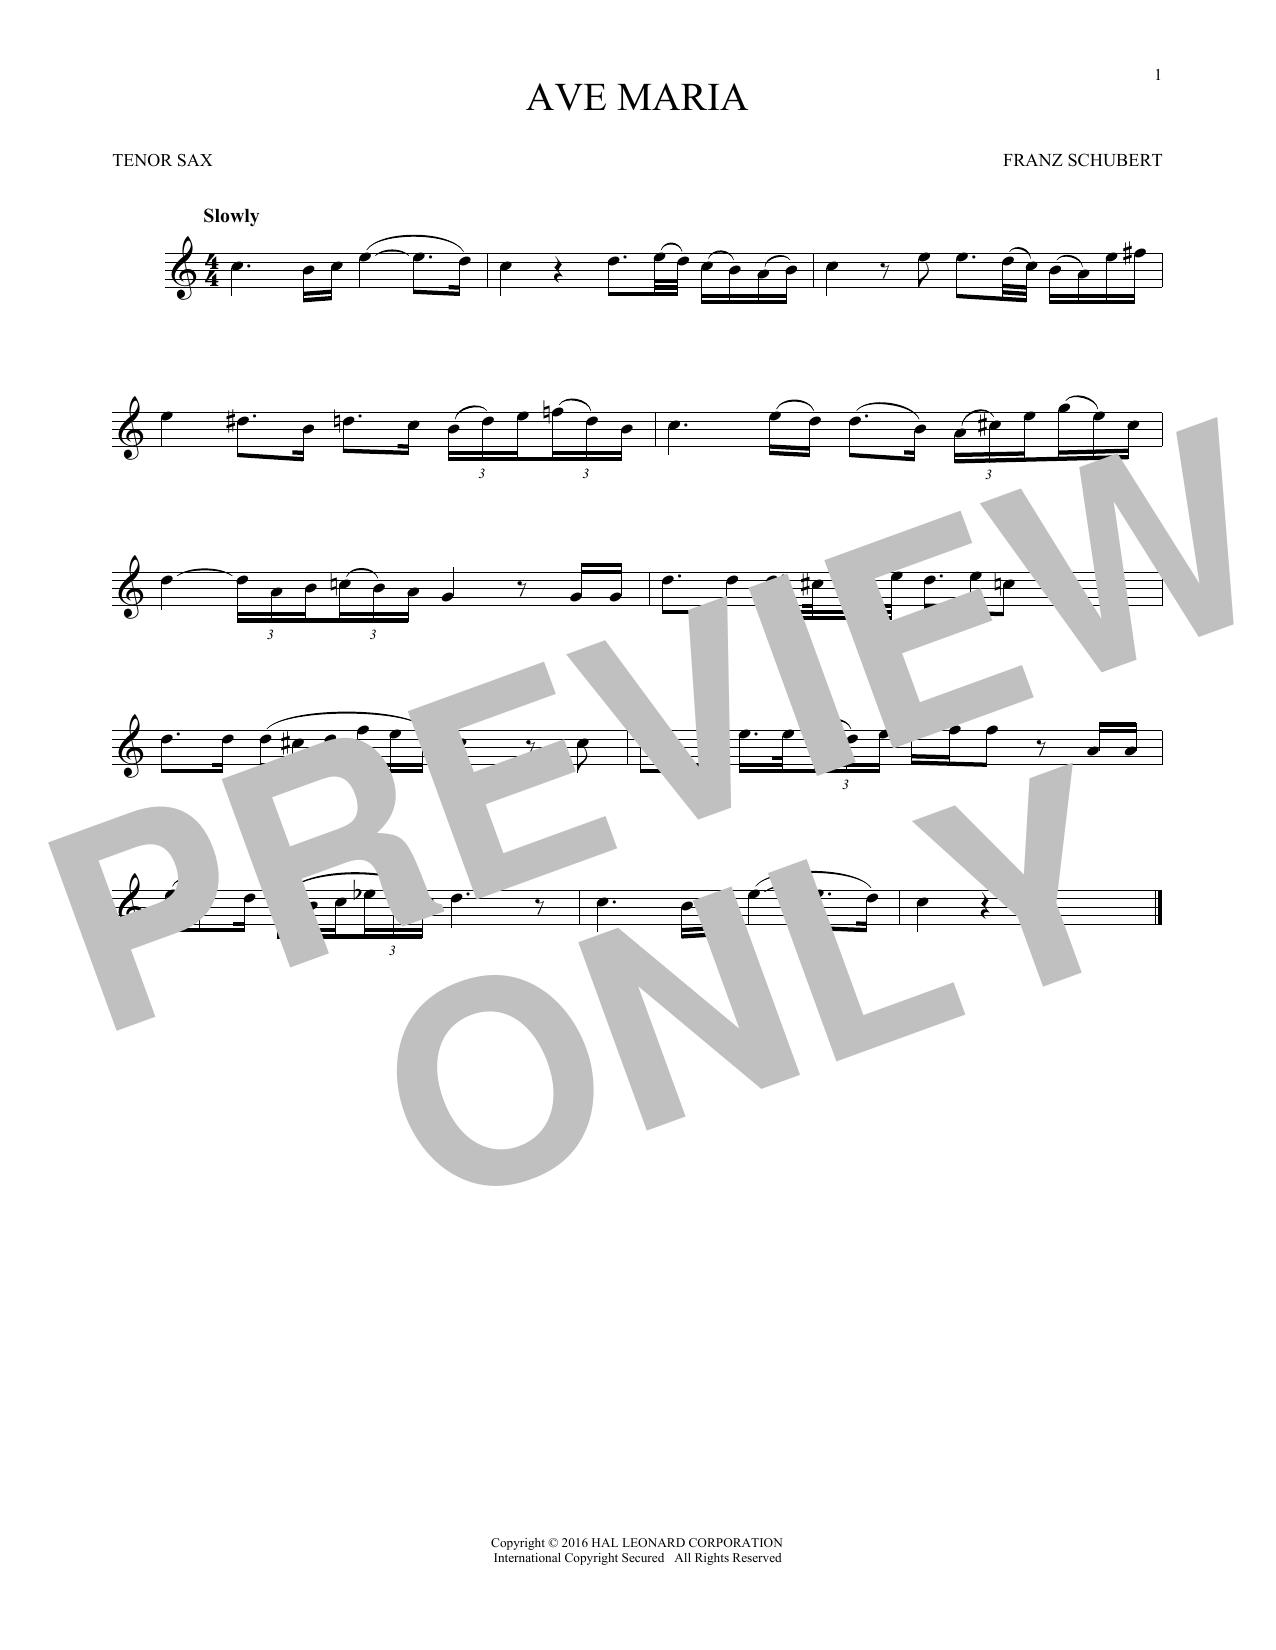 Ave Maria, Op. 52, No. 6 (Tenor Sax Solo)